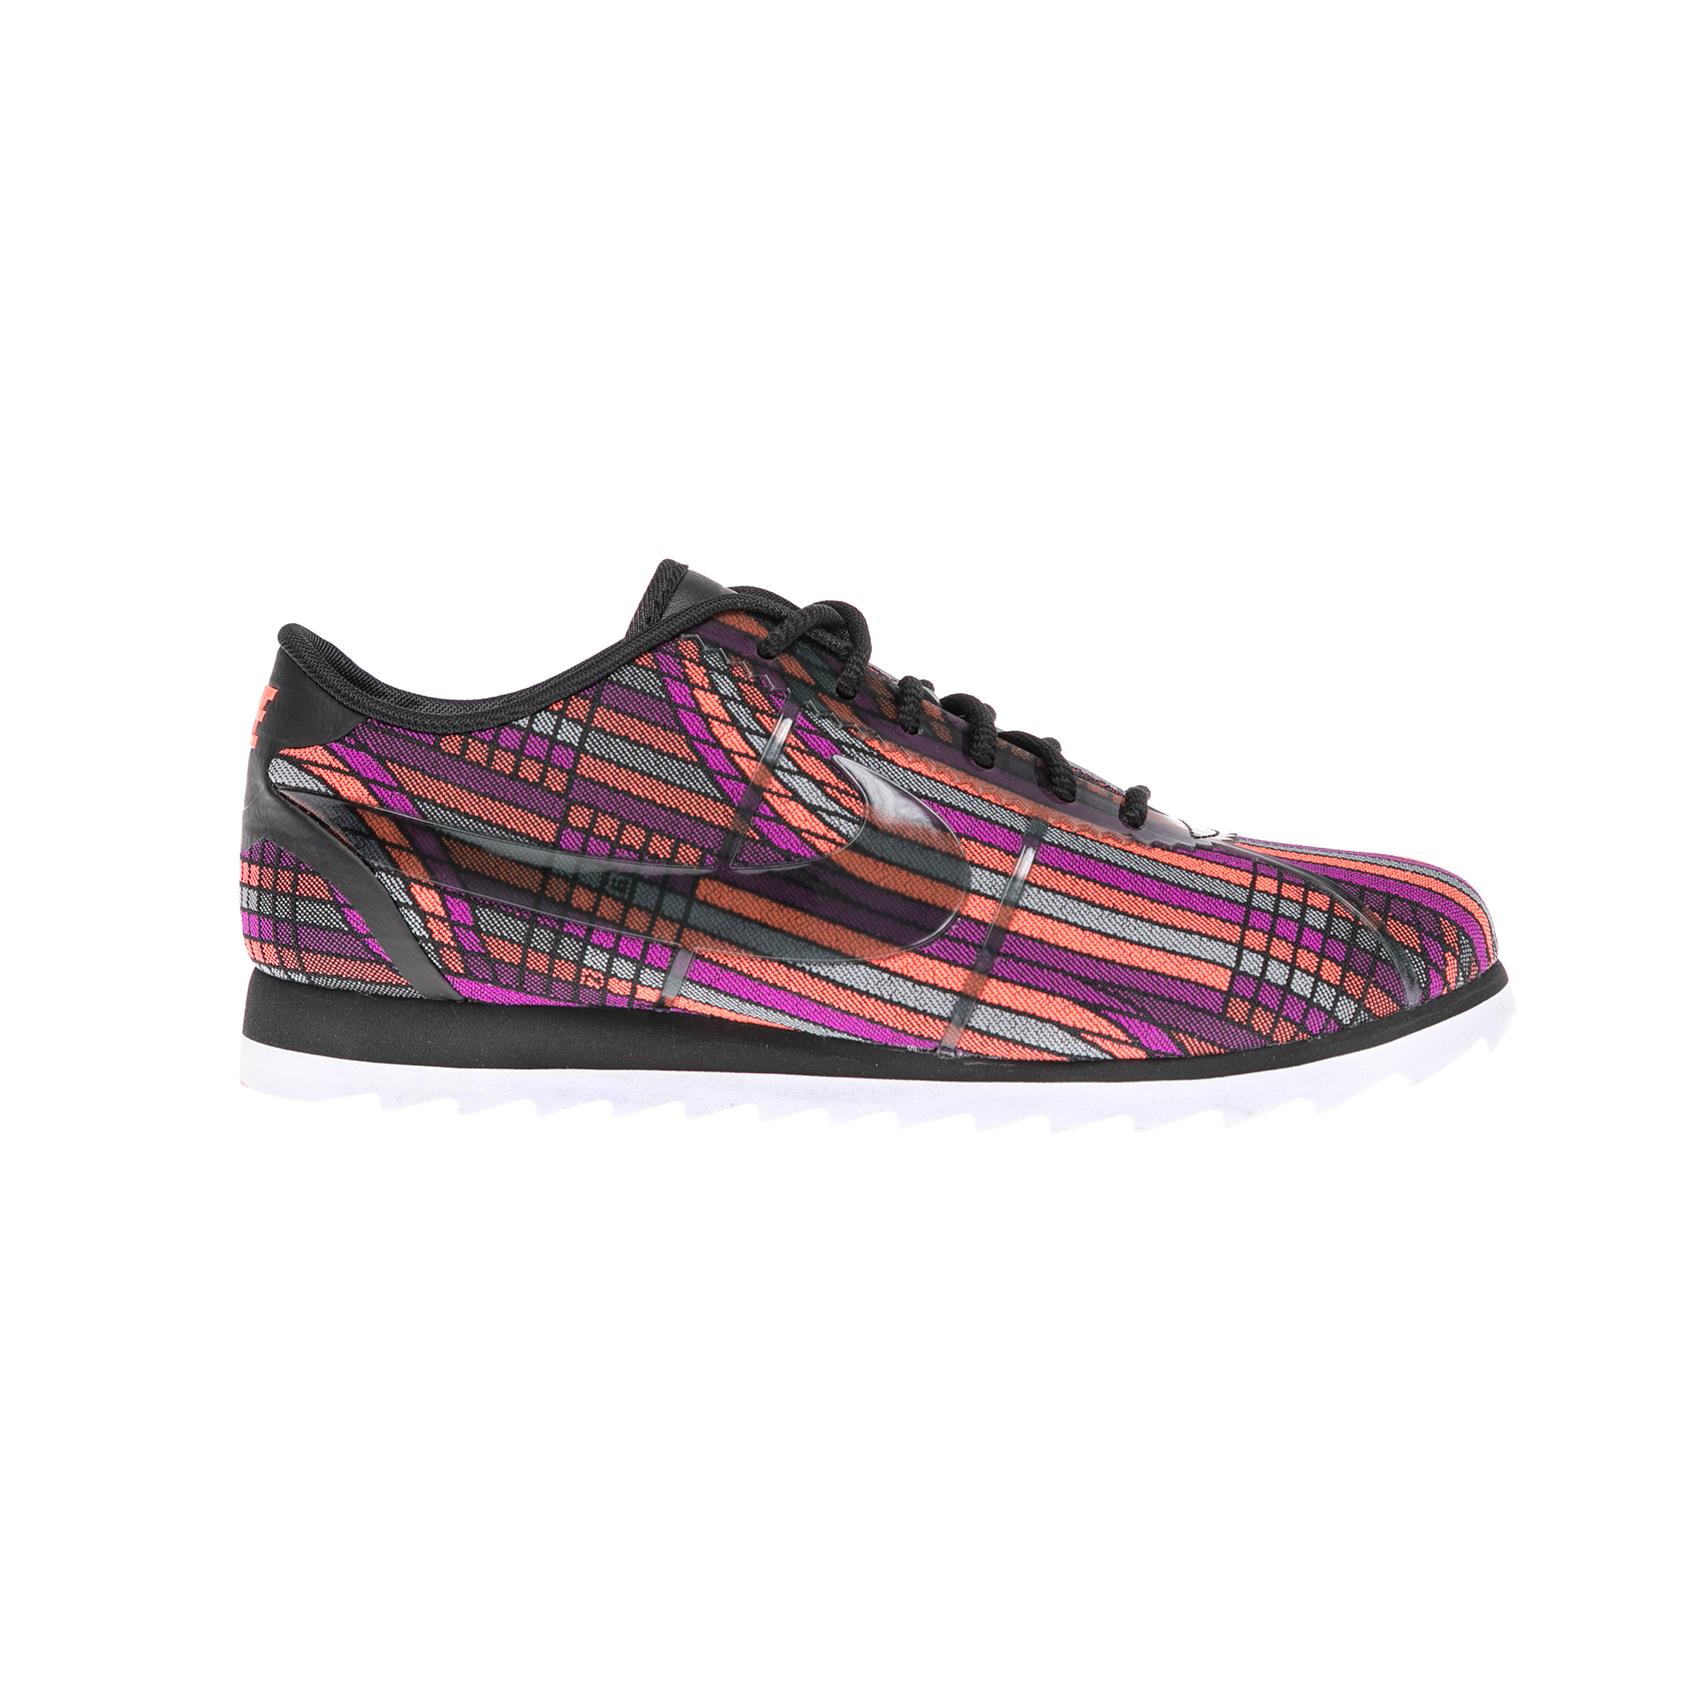 NIKE – Γυναικεία αθλητικά παπούτσια NIKE CORTEZ ULTRA πολύχρωμα